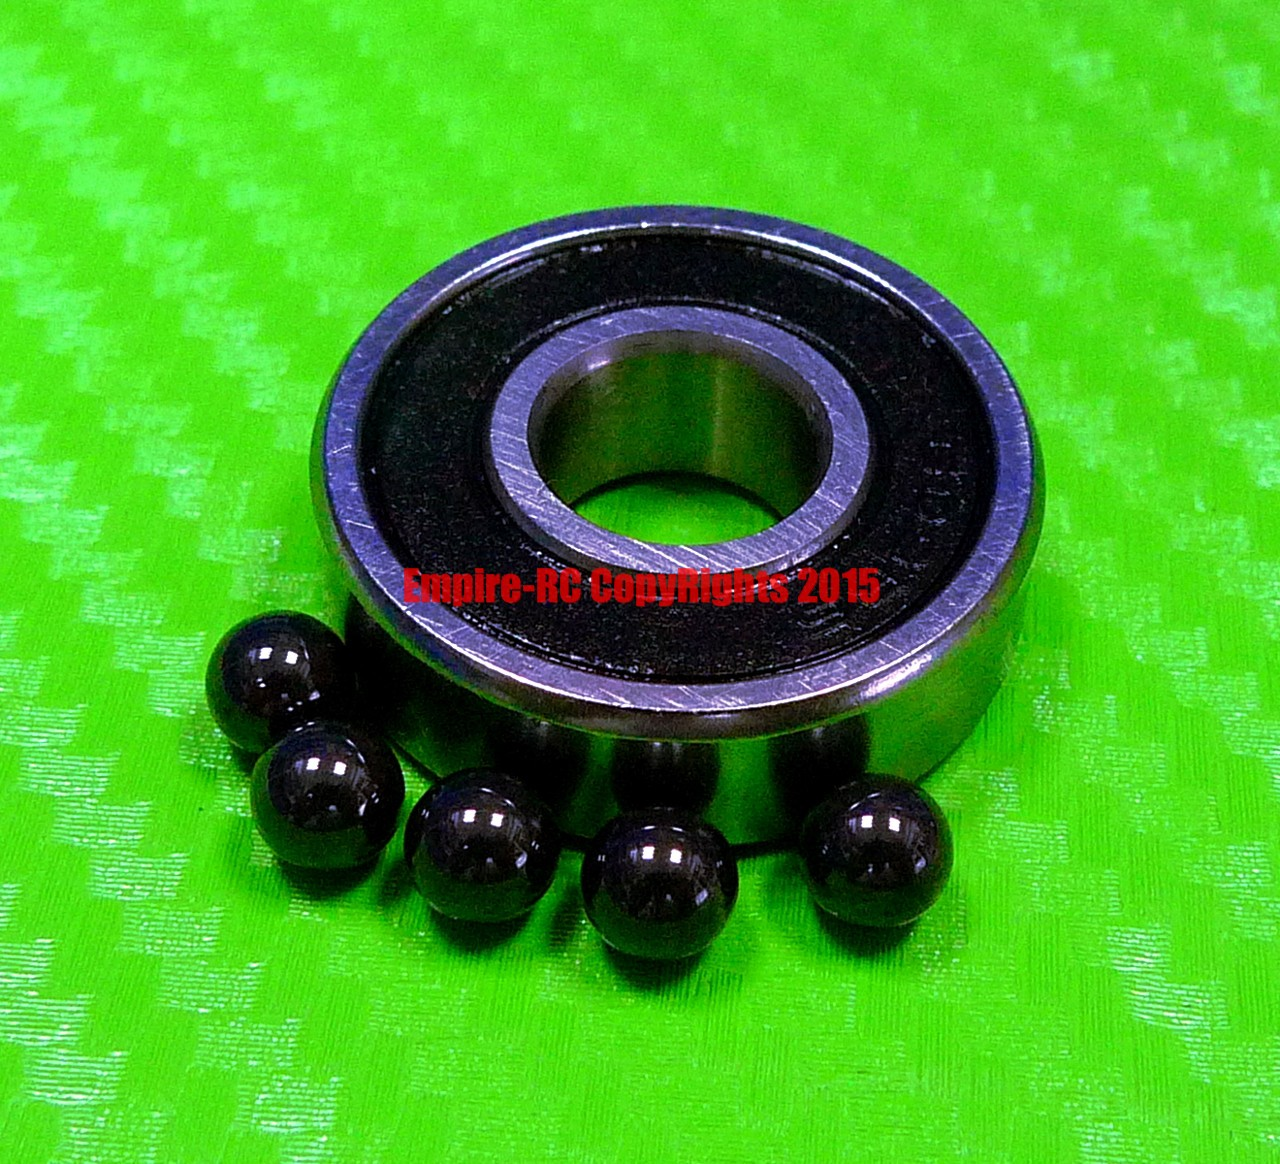 10x19x7 mm 4PCS 63800-2RS Hybrid Ceramic Chrome Metal Bearing Bearings 63800RS